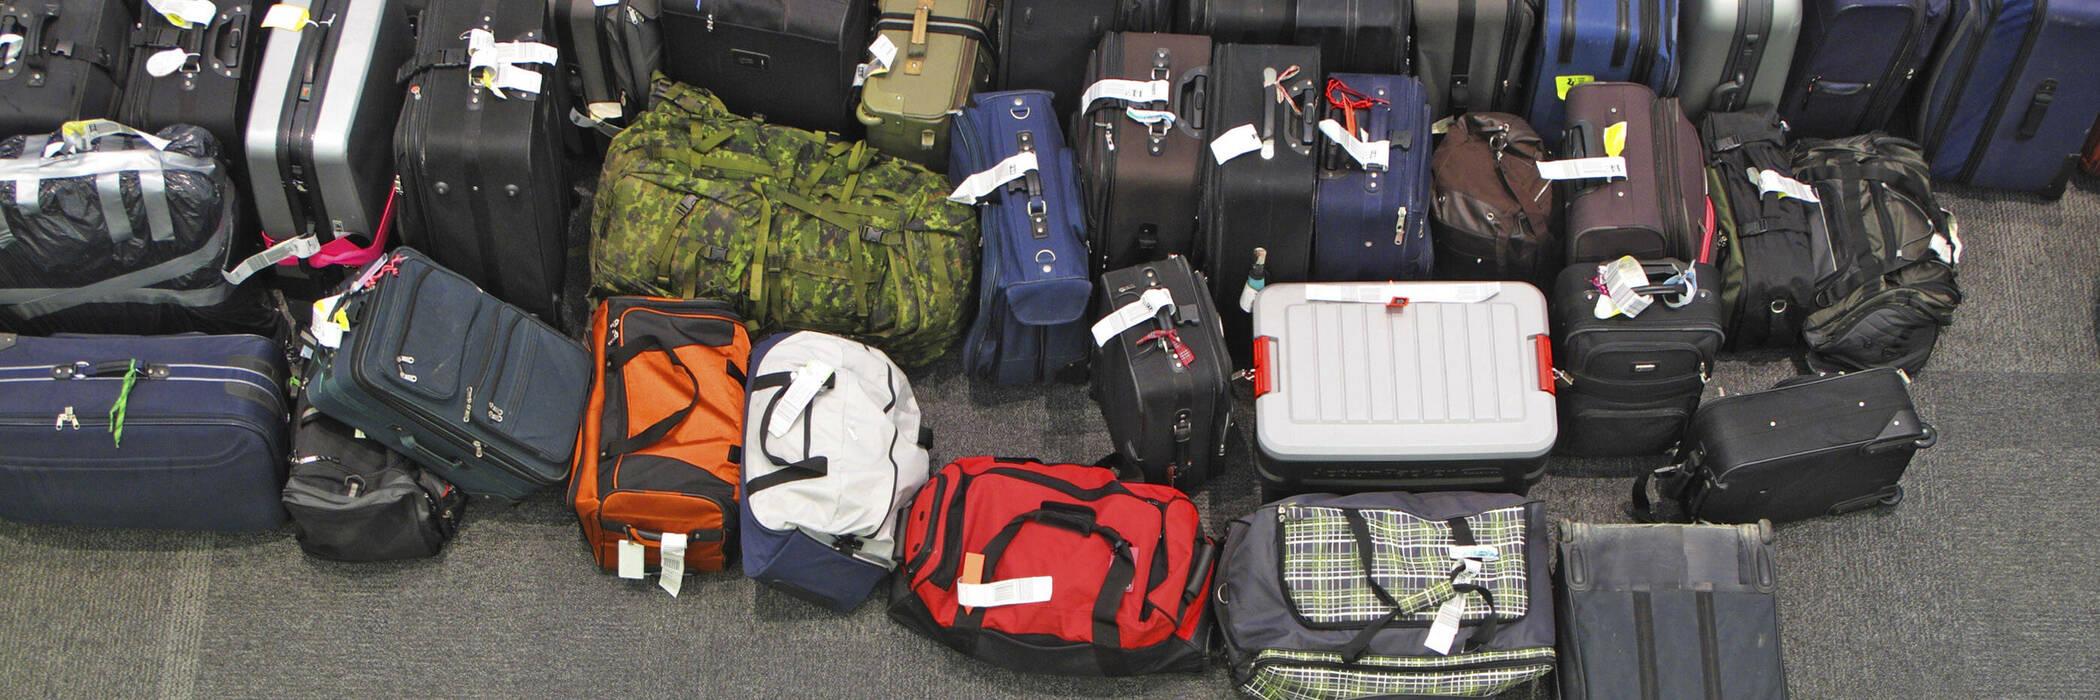 16apr lost luggage liability limited hero